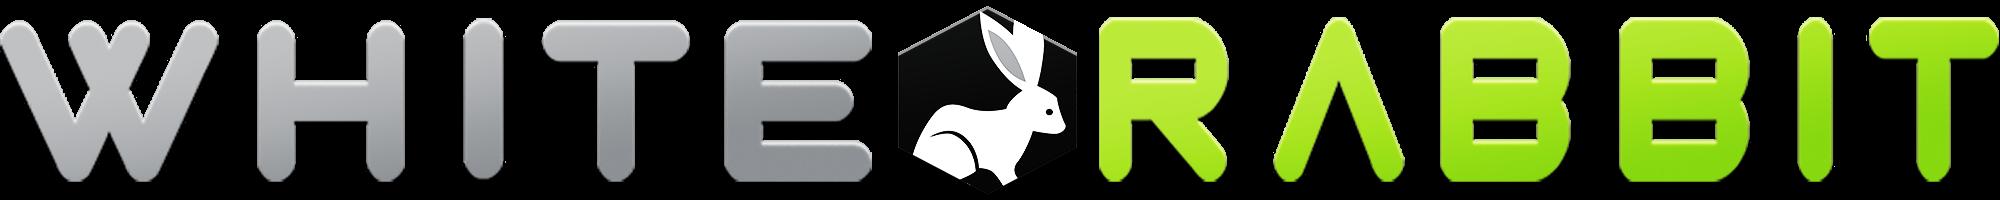 Clipart rabbit arctic hare. White logo